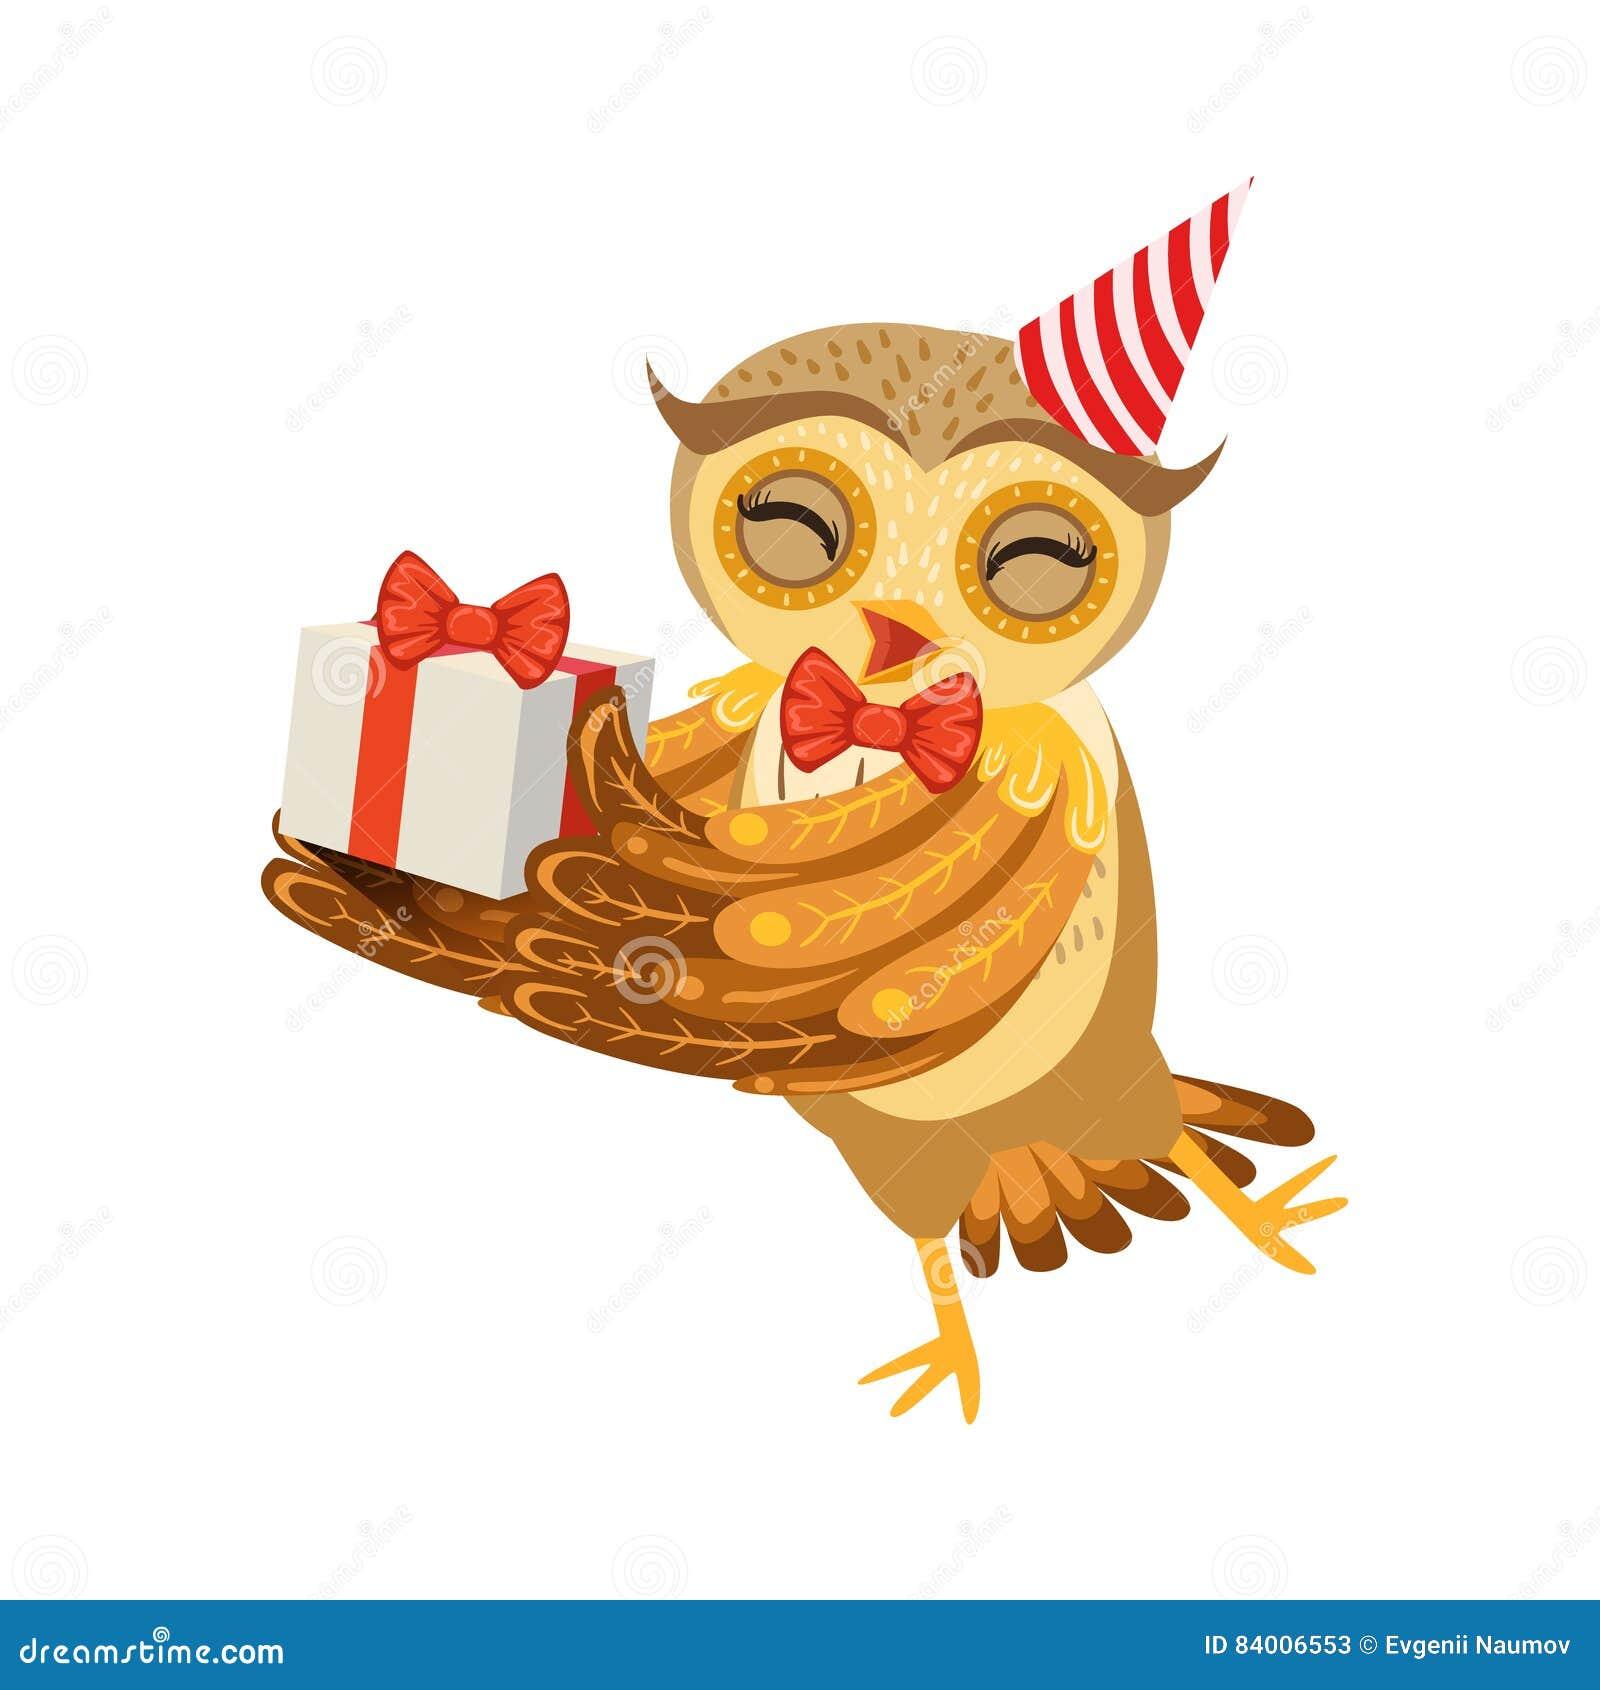 personnage de dessin anim emoji d owl and birthday present cute avec forest bird showing human